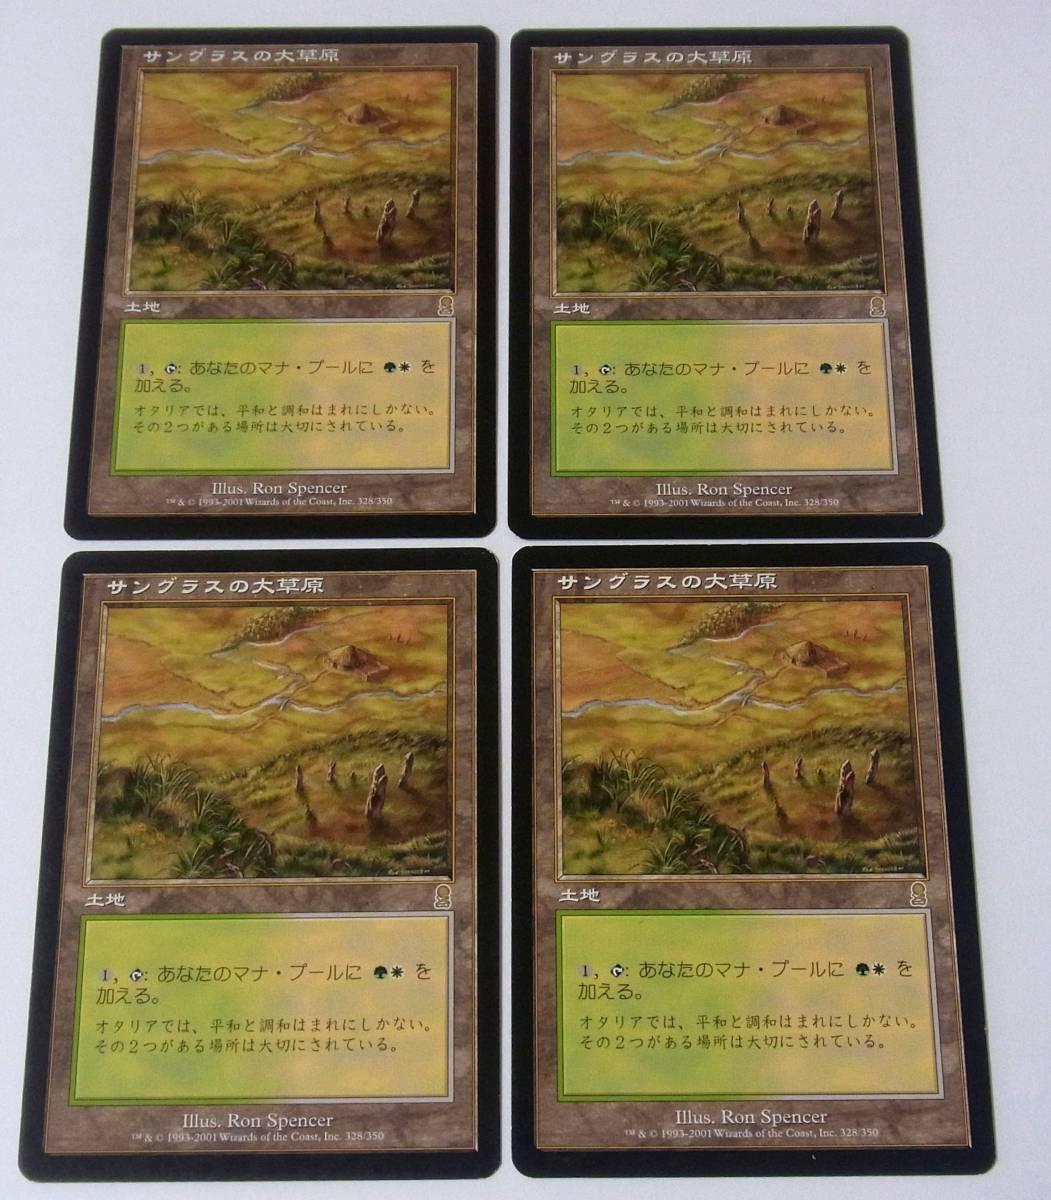 MTG165★ODY サングラスの大草原/Sungrass Prairie 日本語版 4枚セット 中古品 _画像1